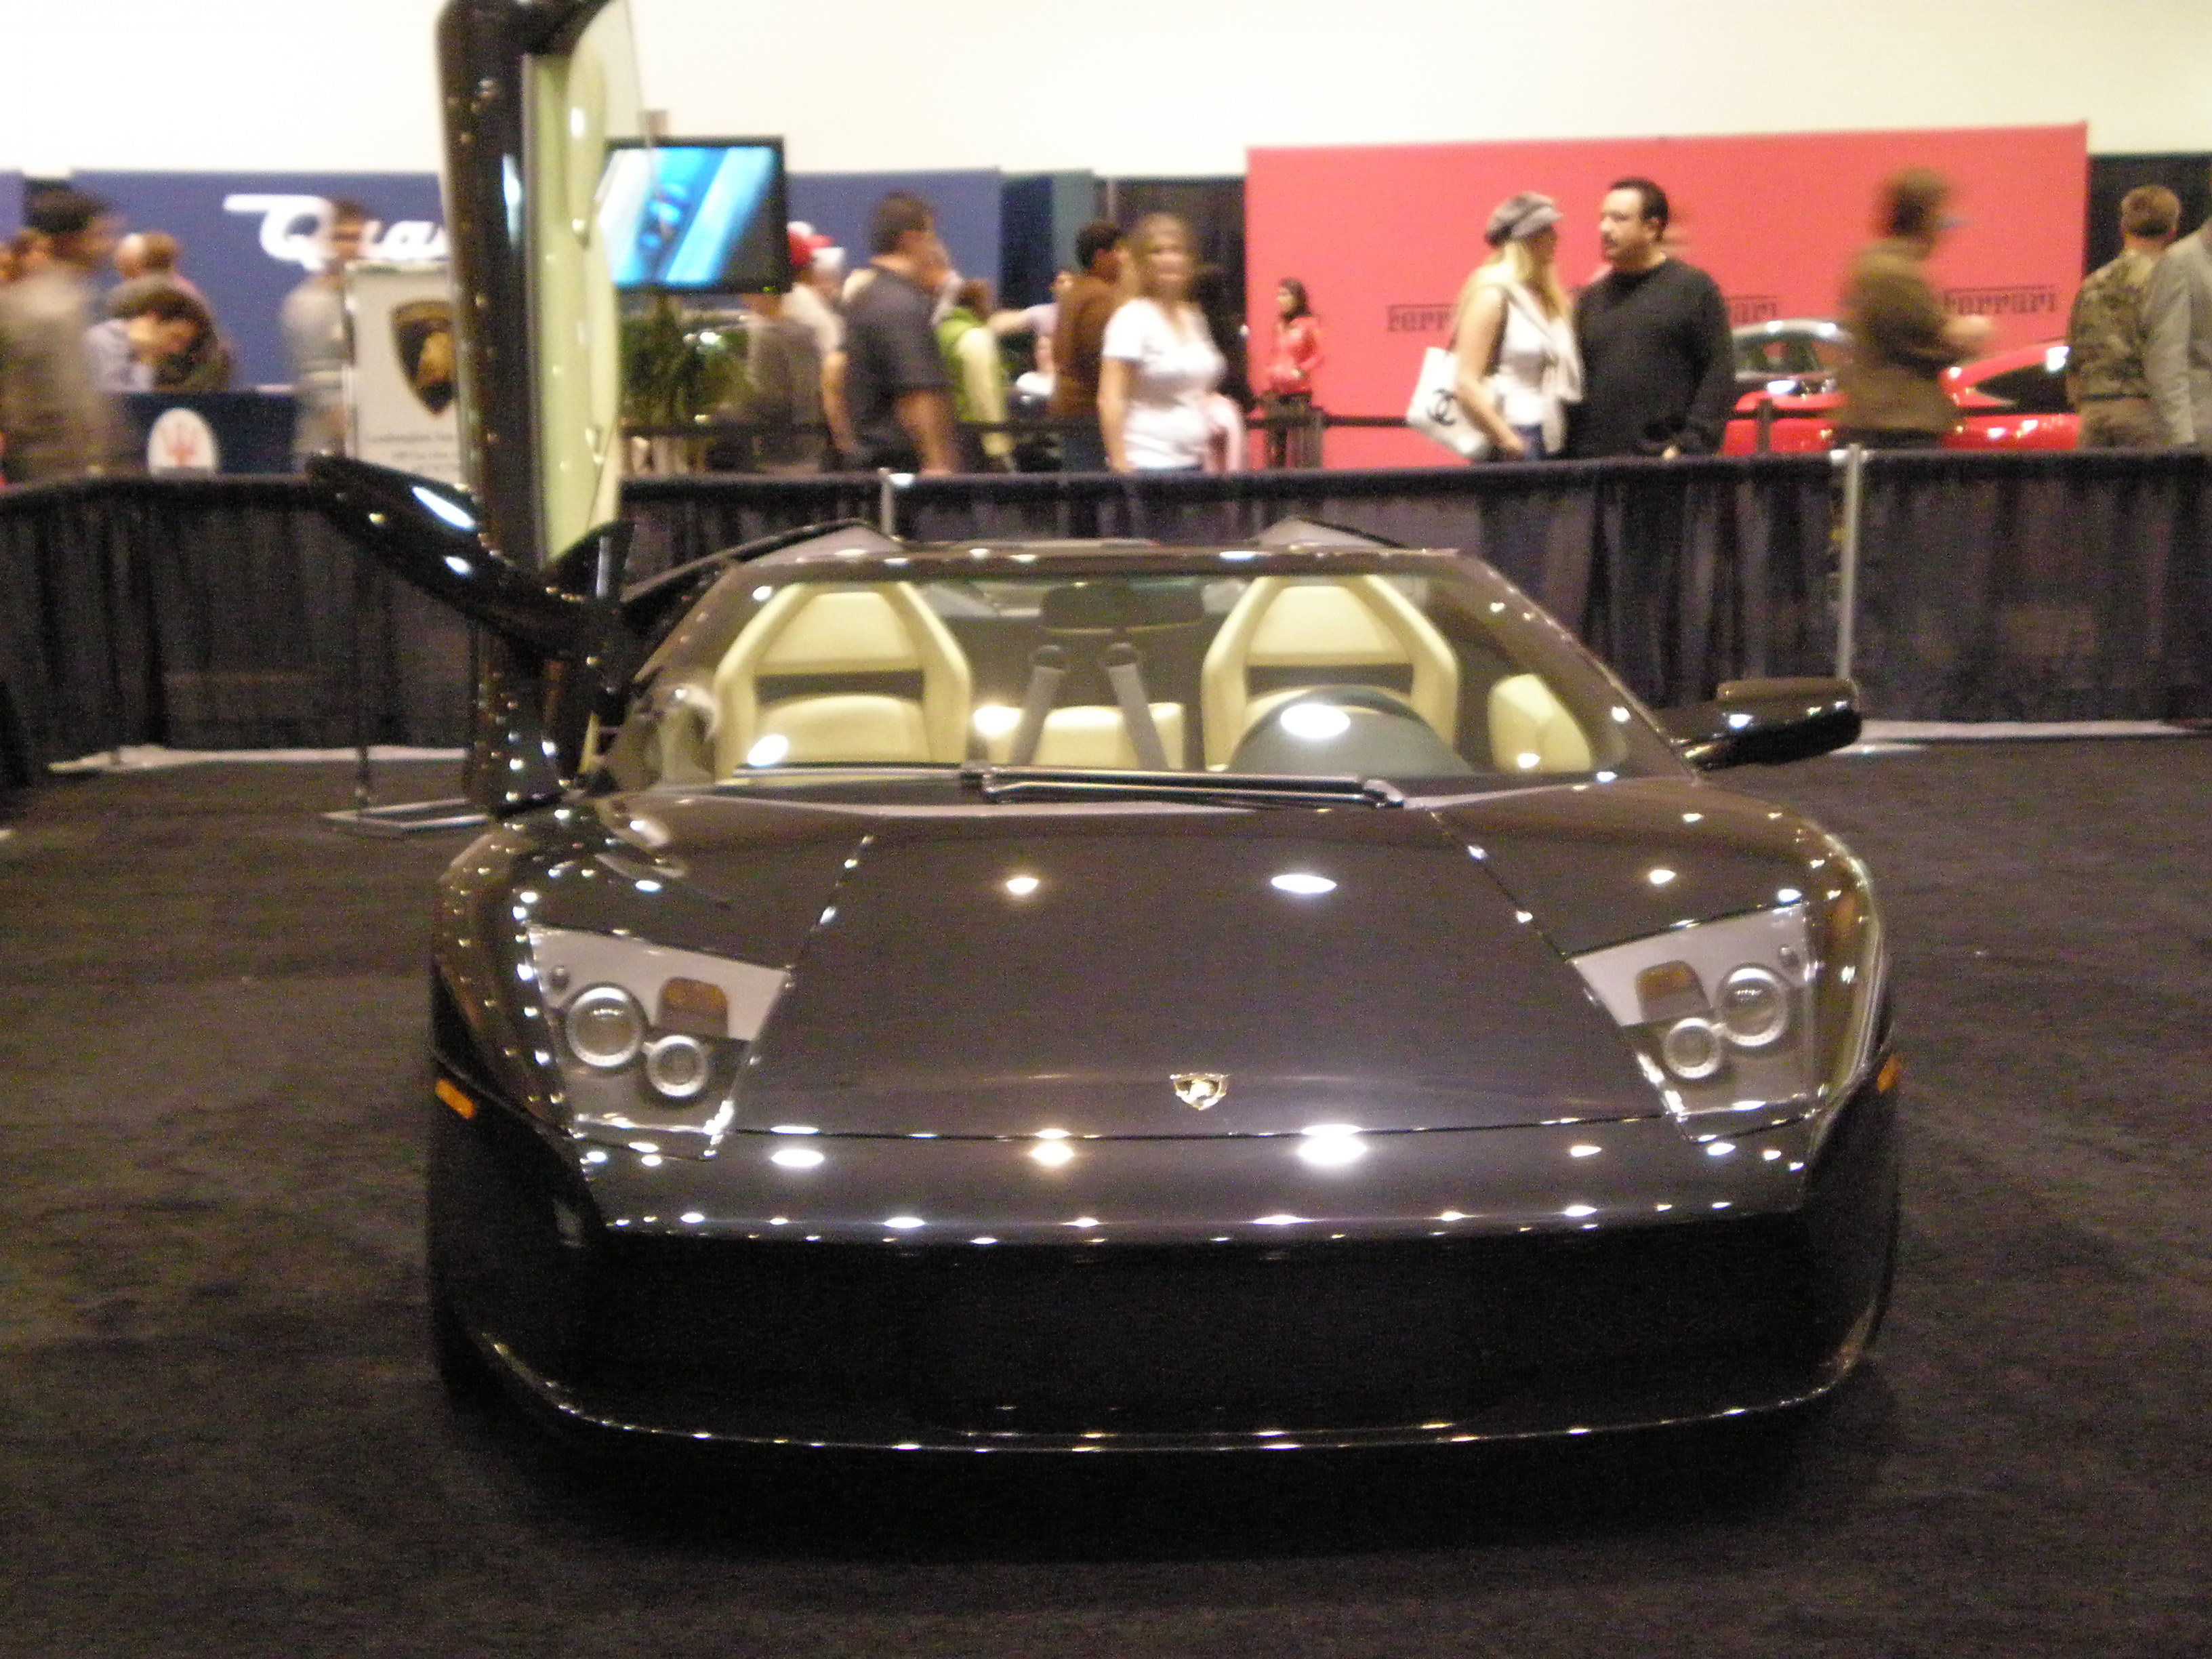 File:2005 Blue Lamborghini Murcielago Roadster Front.JPG